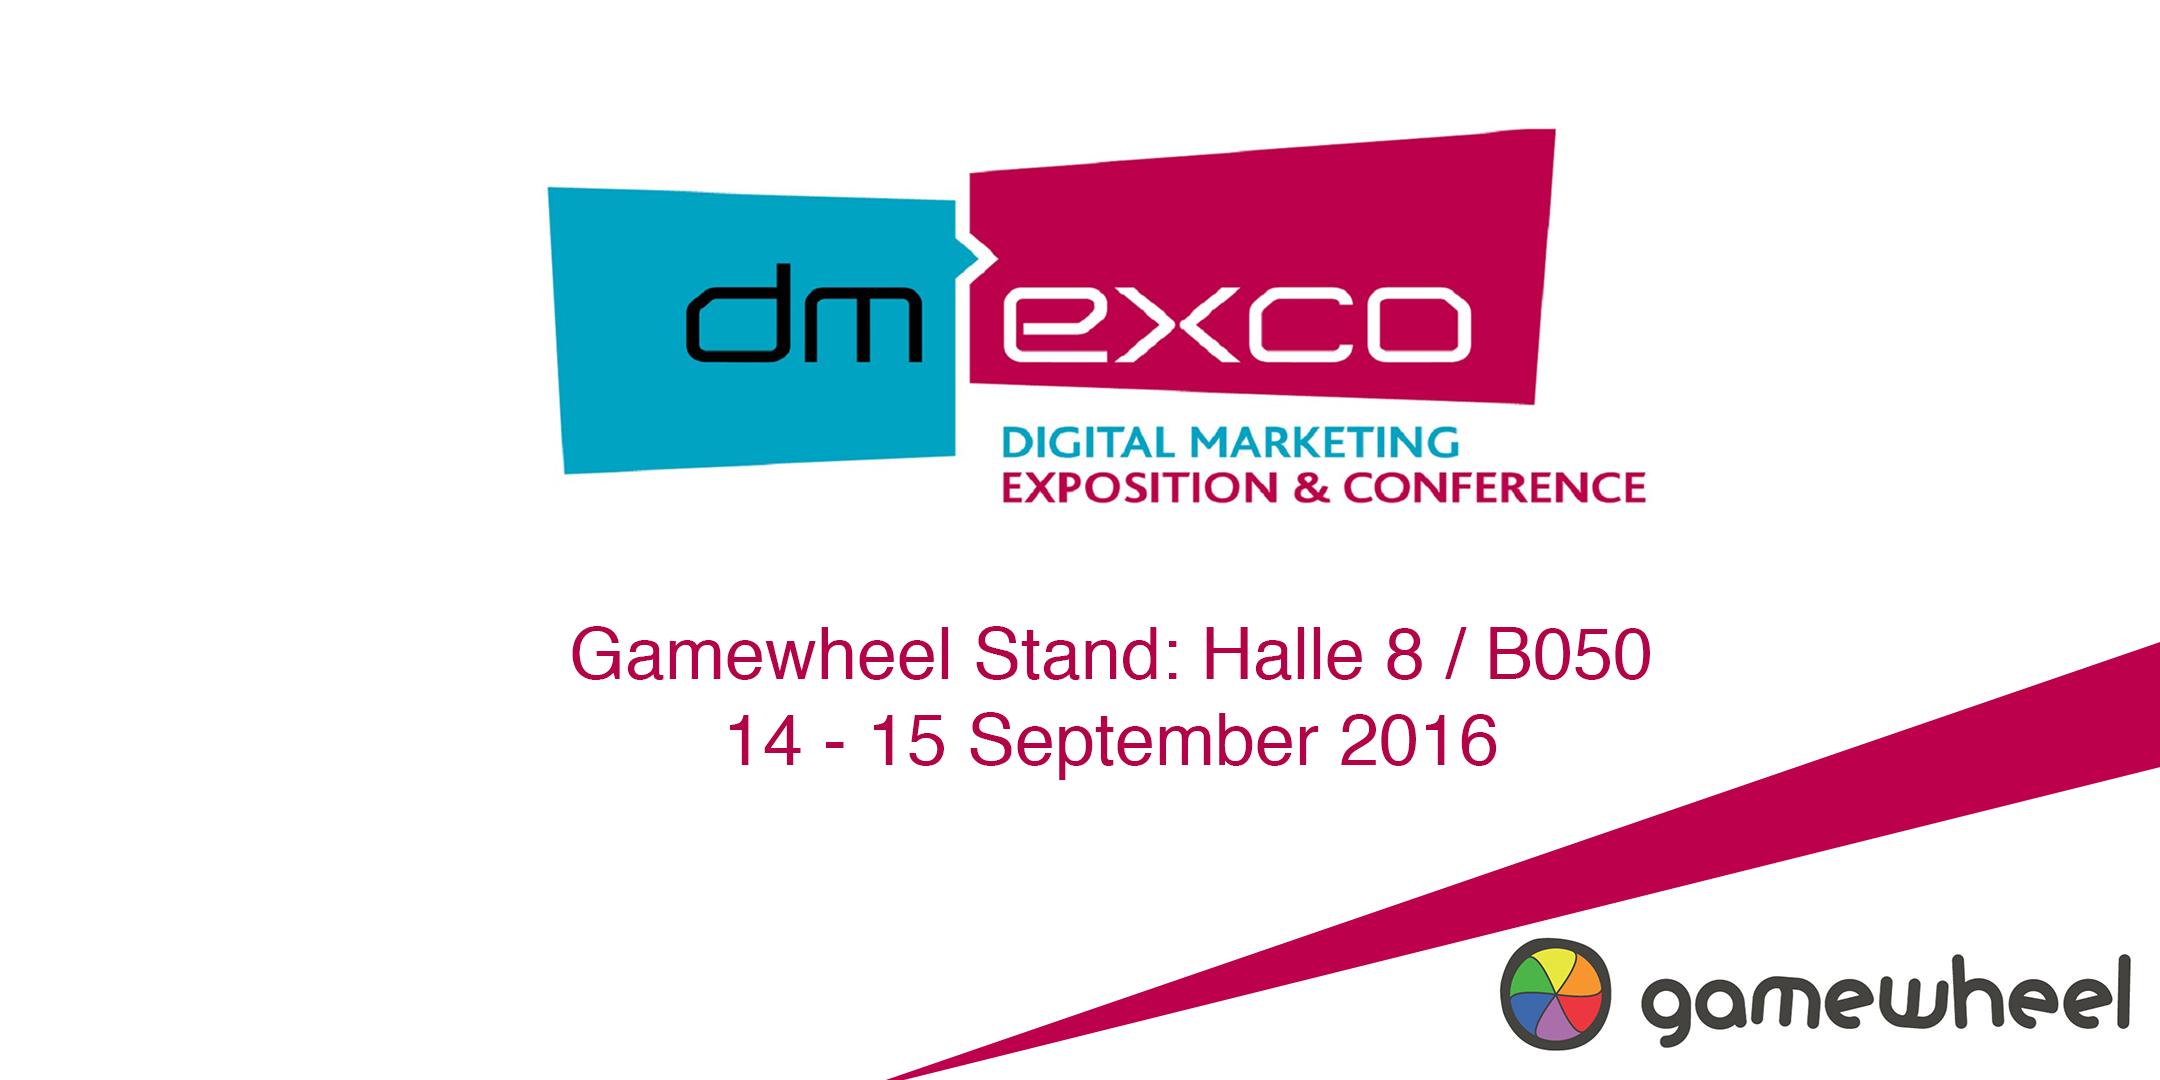 Gamewheel_DMXCO